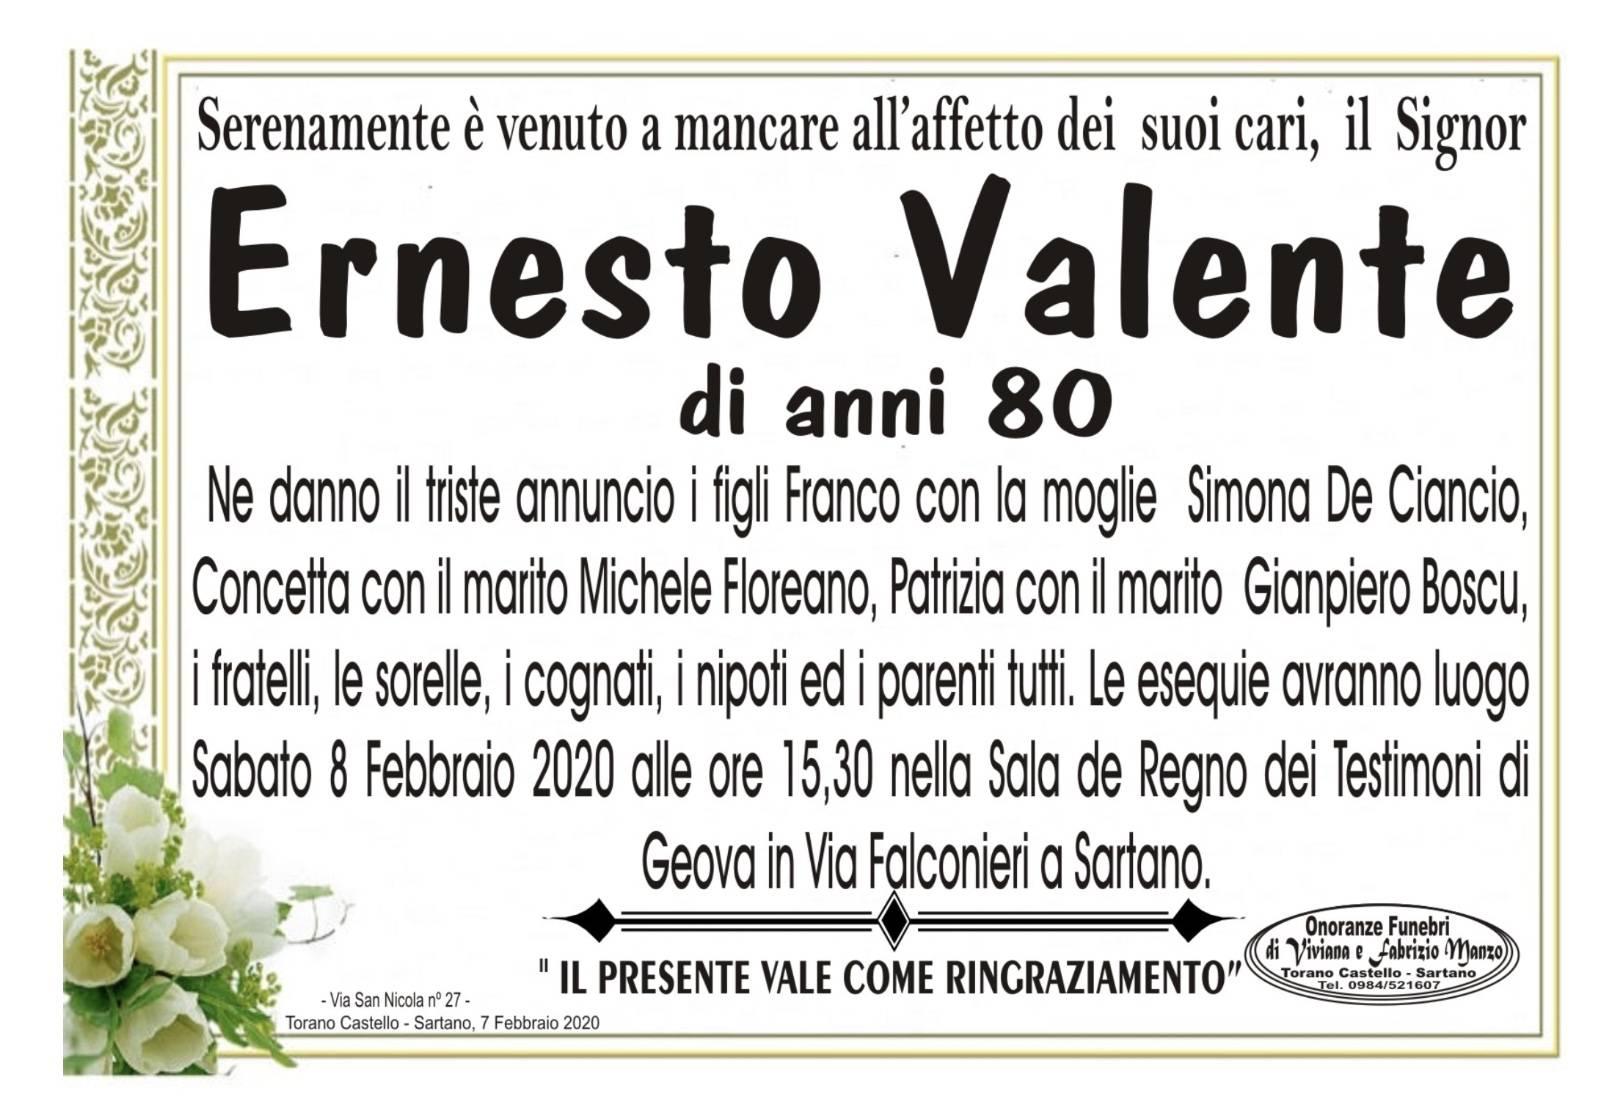 Ernesto Valente